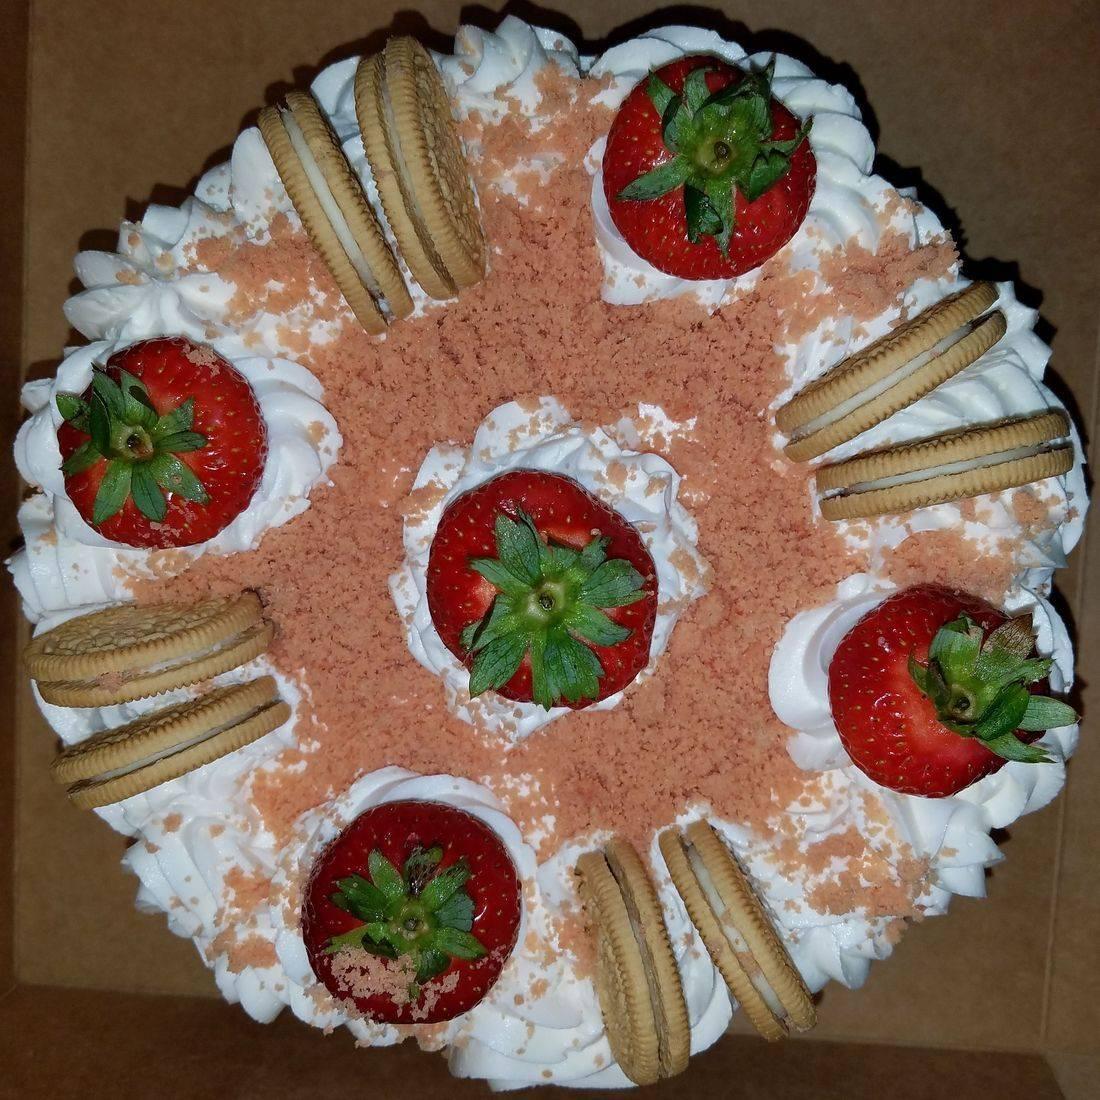 Strawberry Crunch Shortcake Cake